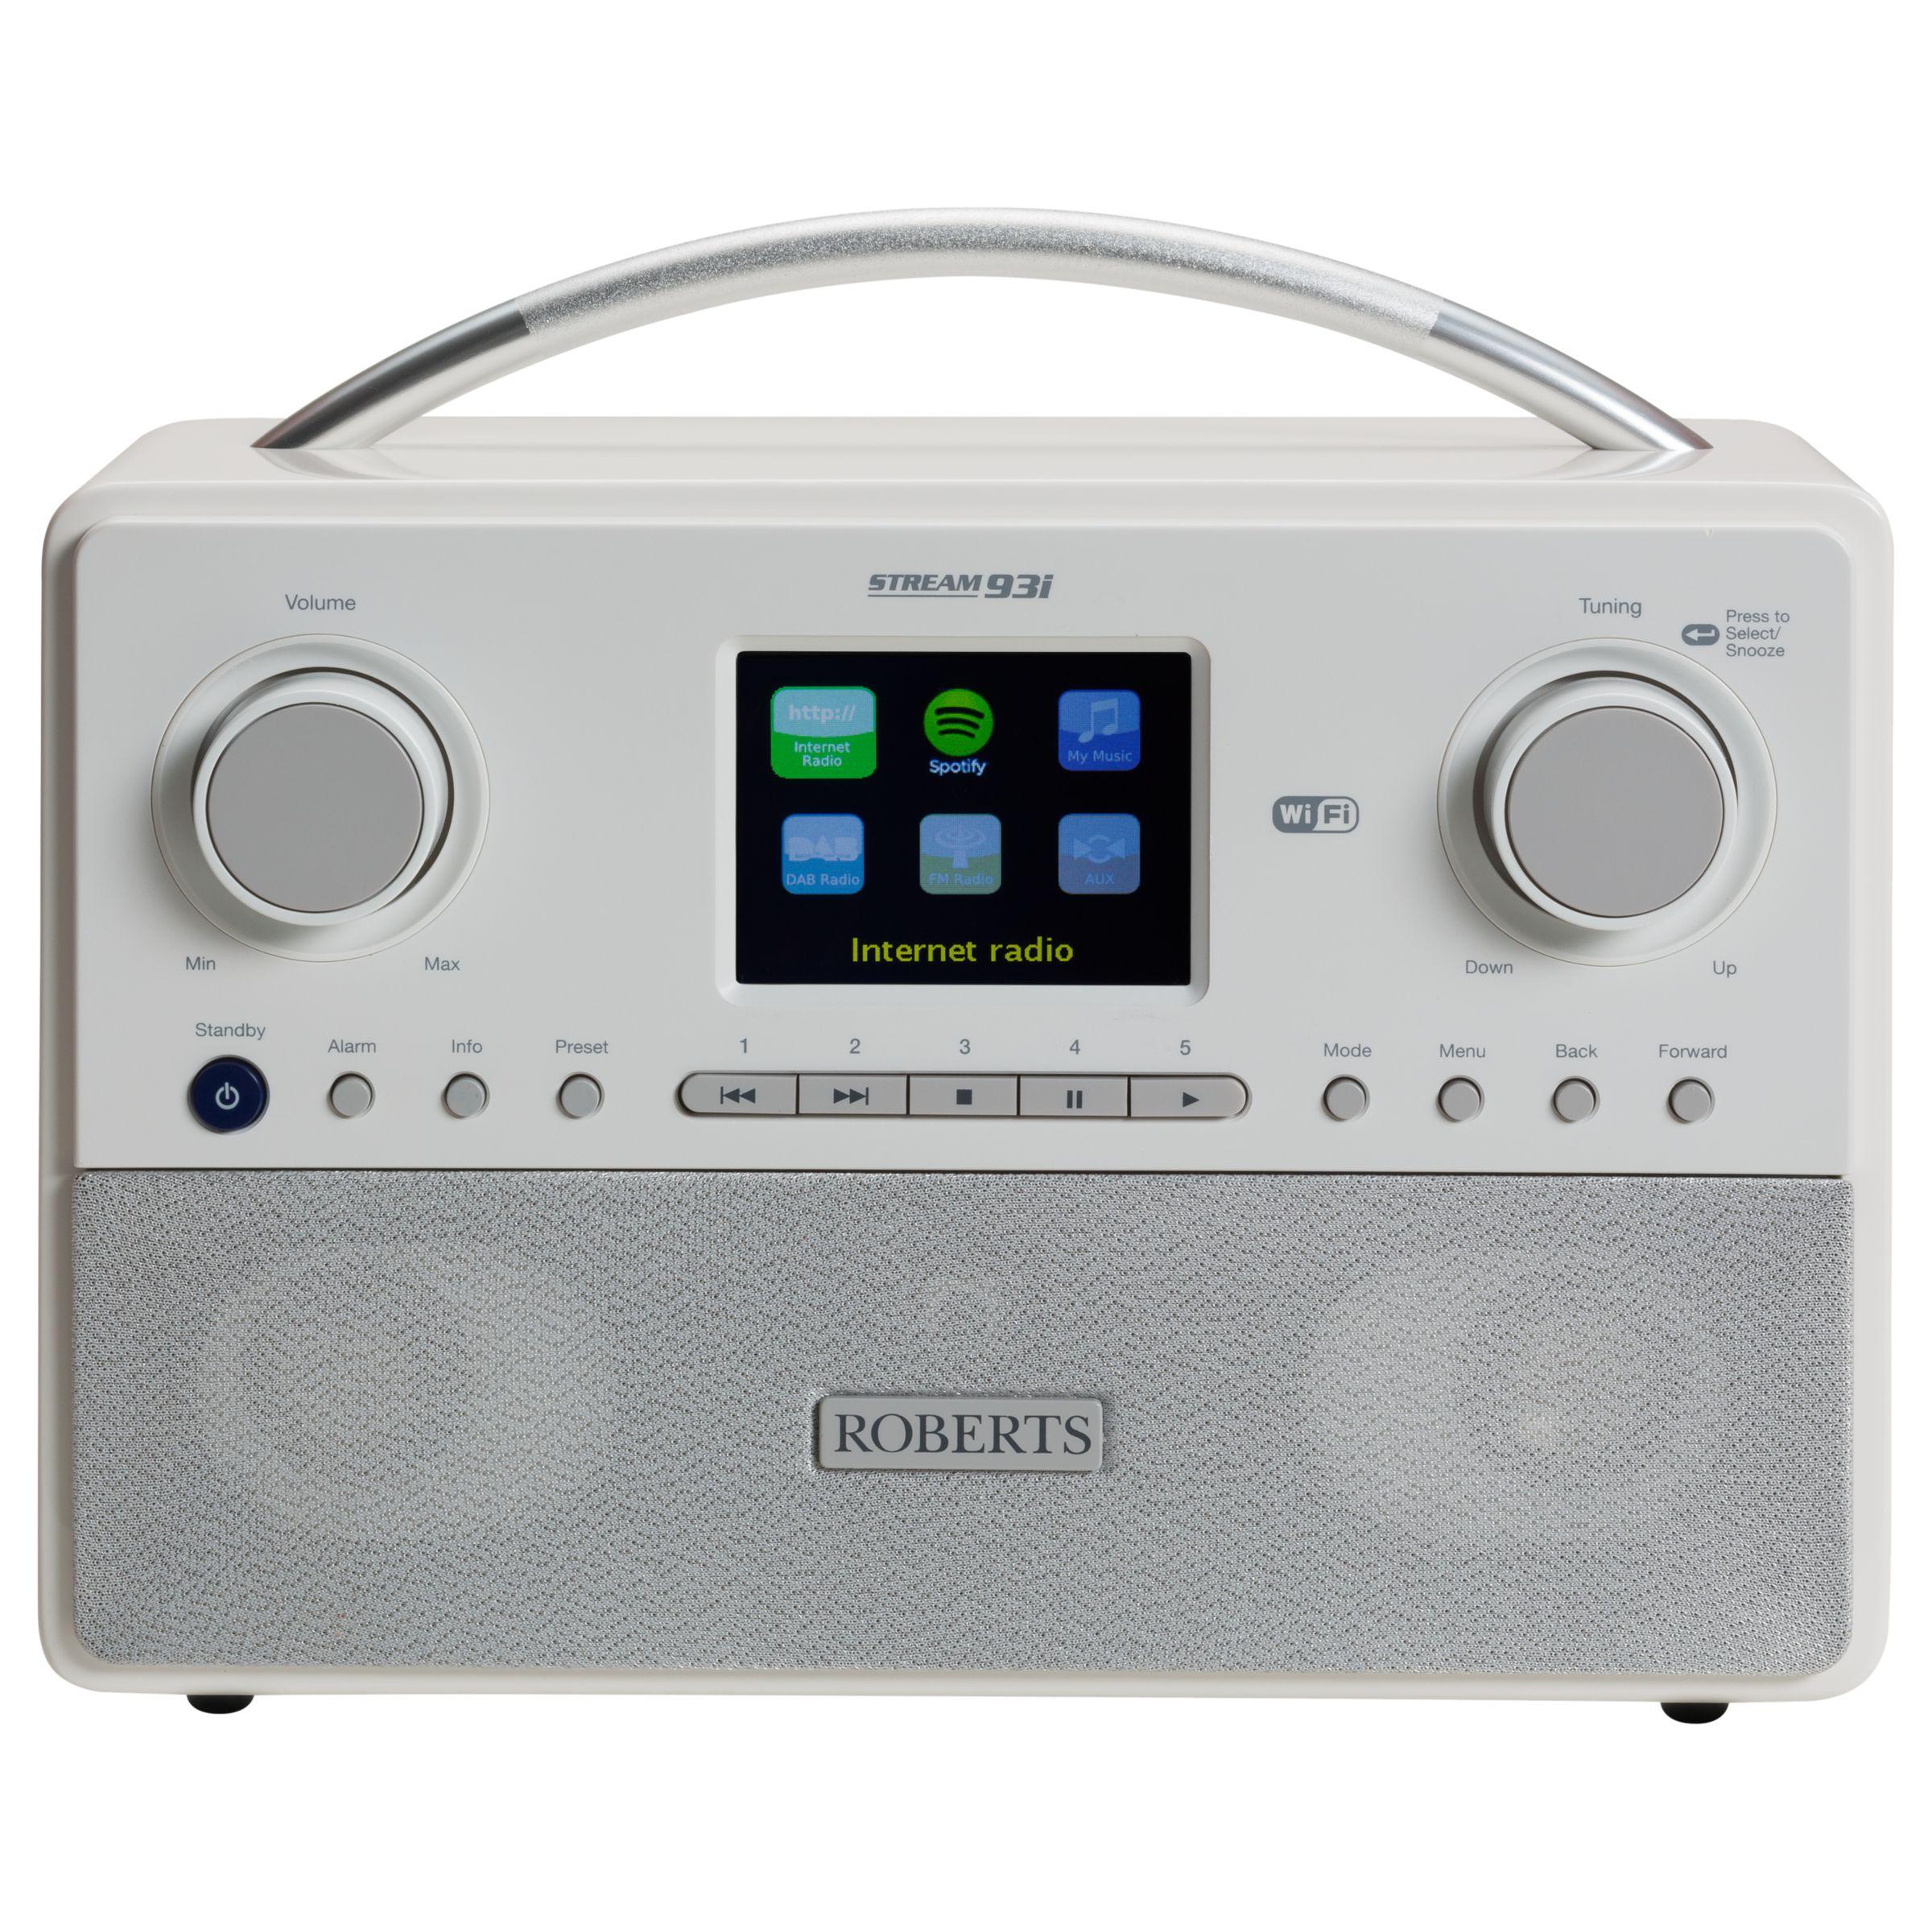 Roberts ROBERTS Stream 93i DAB+/FM Smart Radio